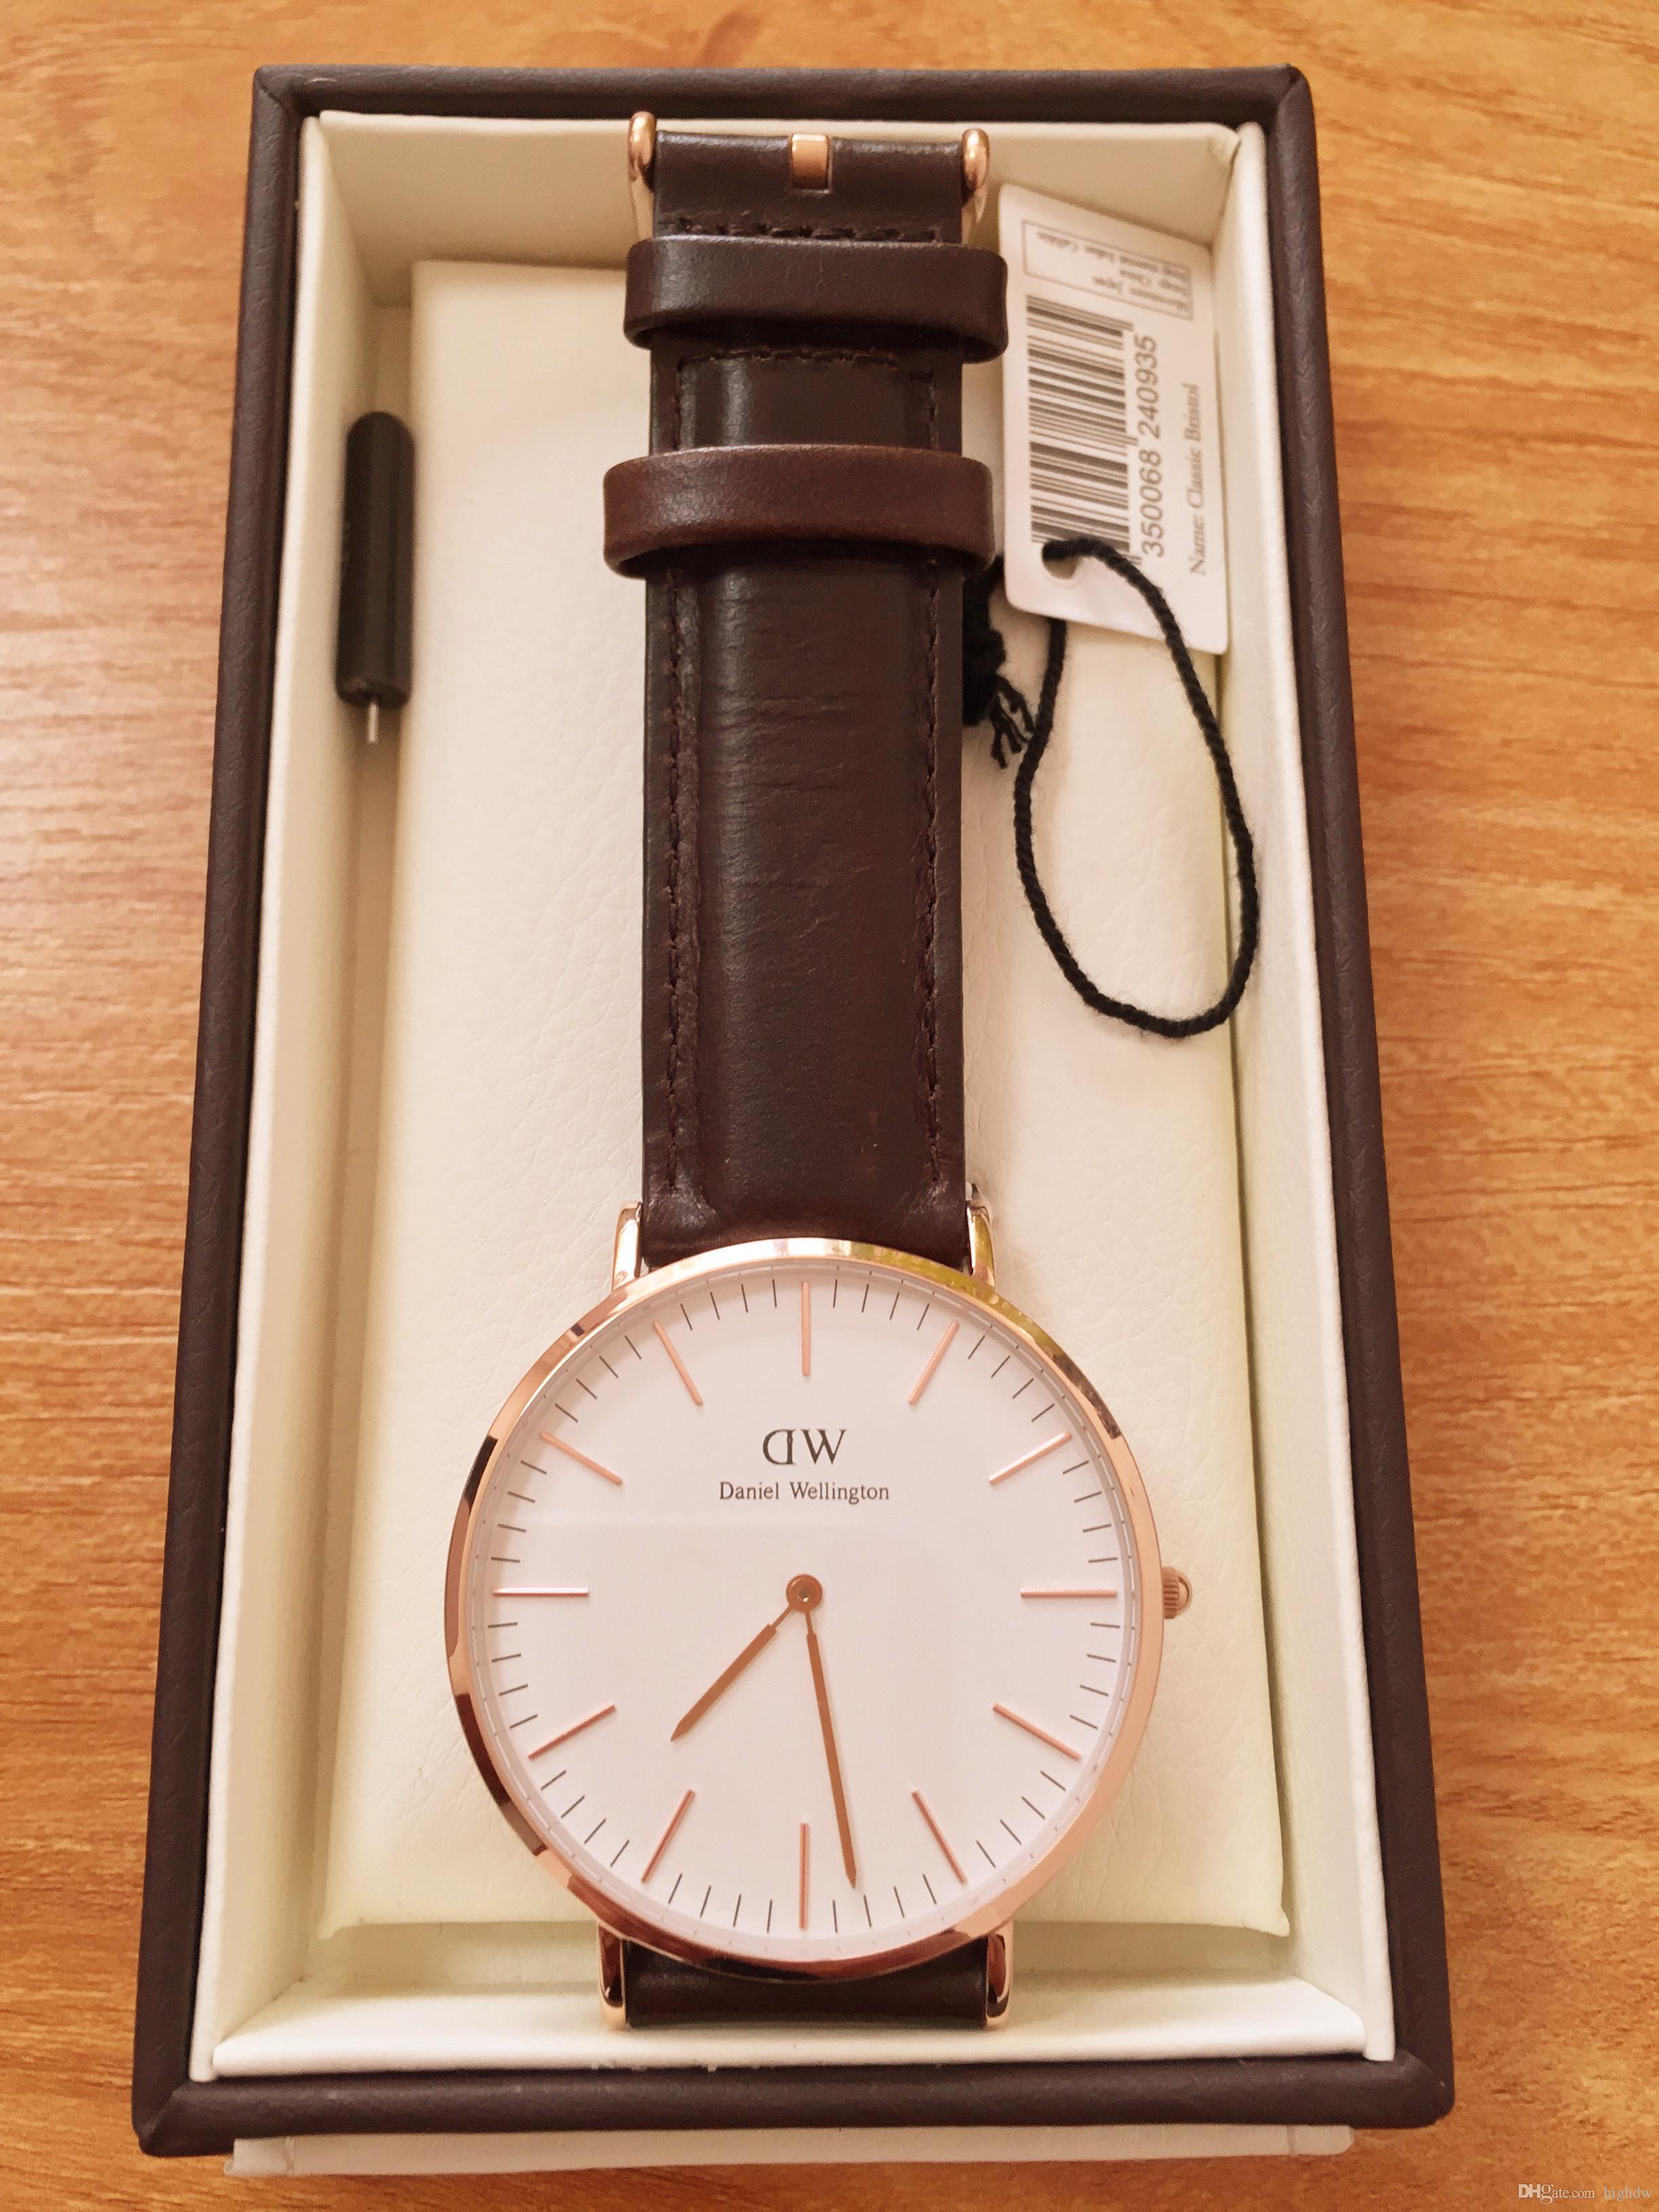 51d02c02b77 Compre Nova Marca De Moda Daniel Wellington Relógios 40mm Homens ...